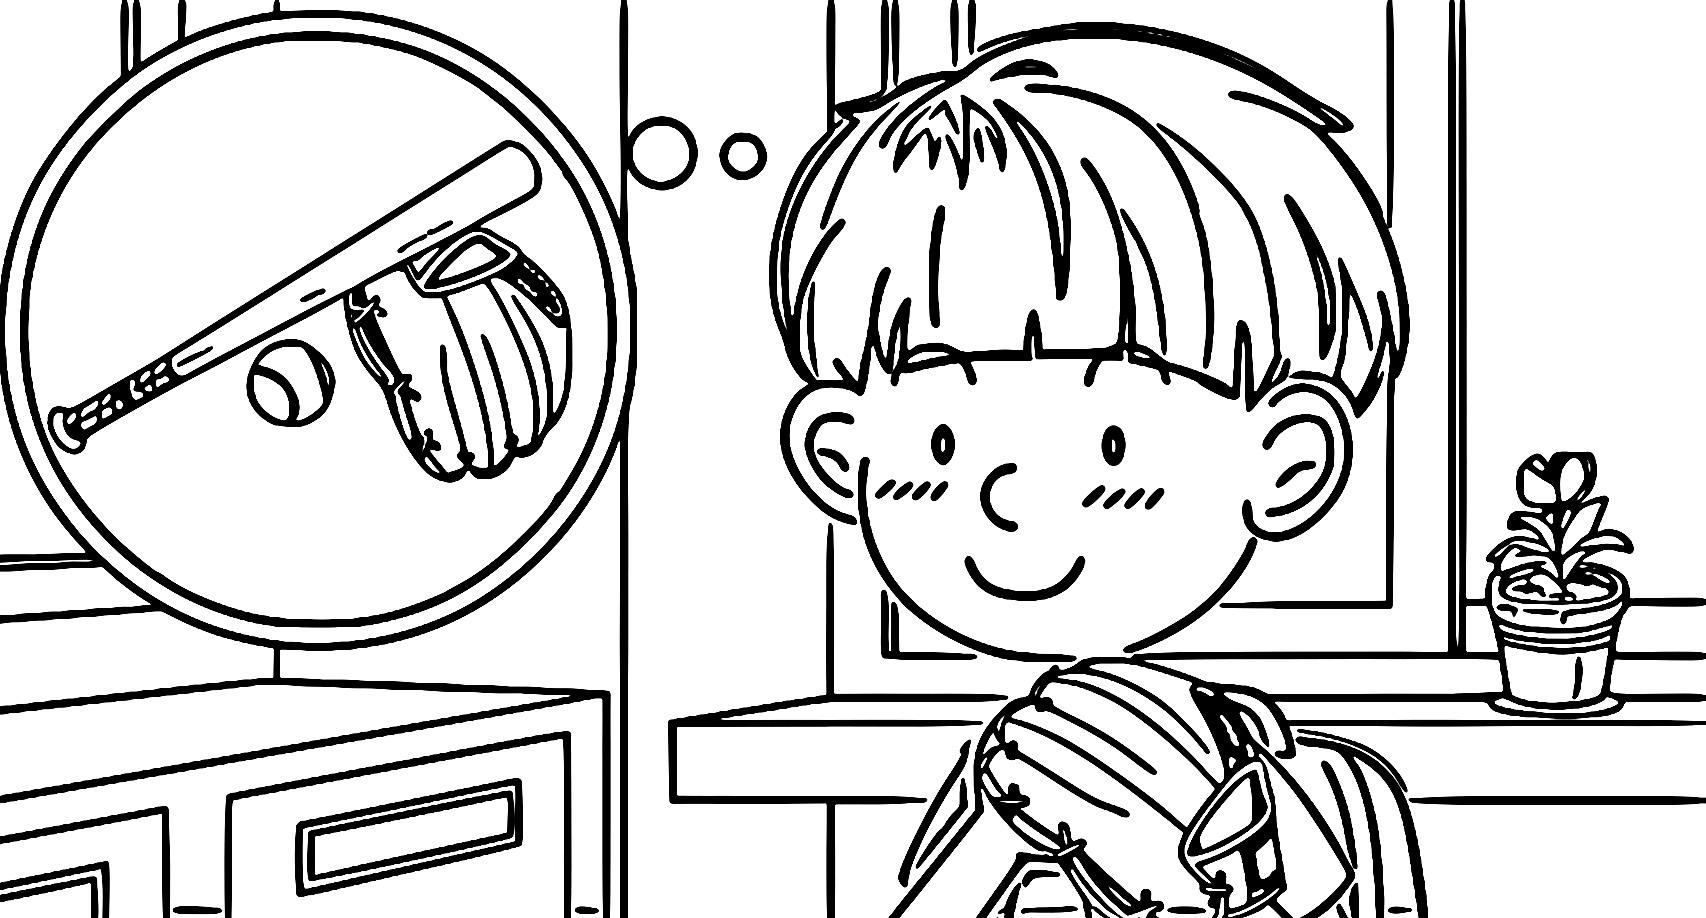 Speaking Cartoon Kids Coloring Page 53